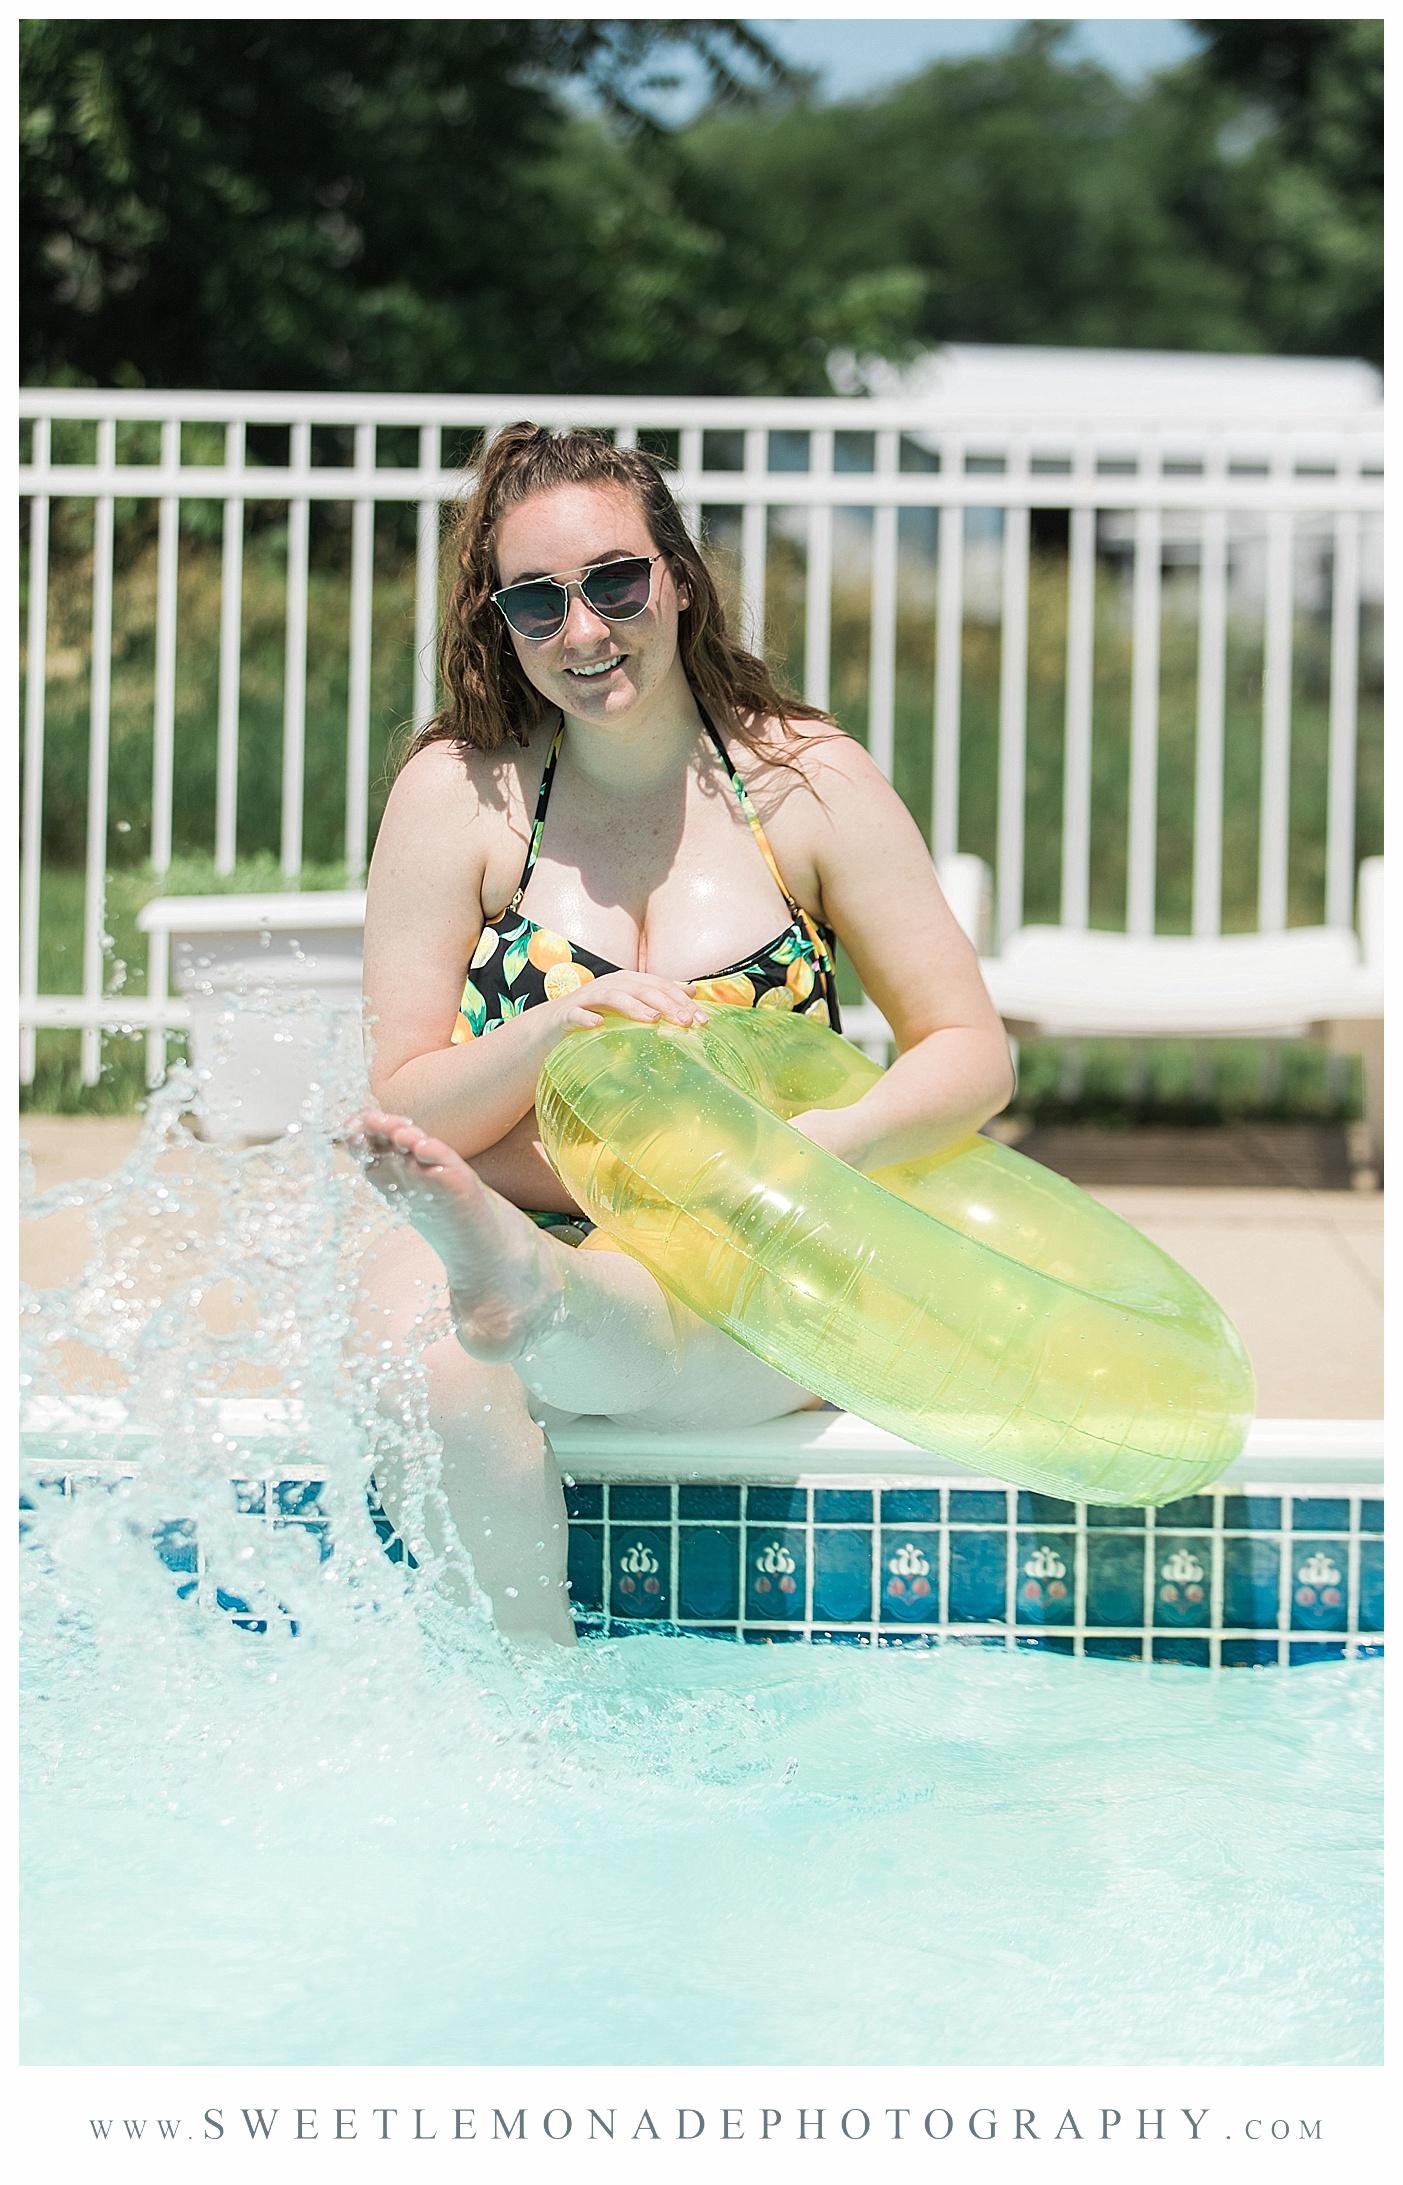 champaign-senior-photographer-sweet-lemonade-photography-senior-pictures-pool_2171.jpg